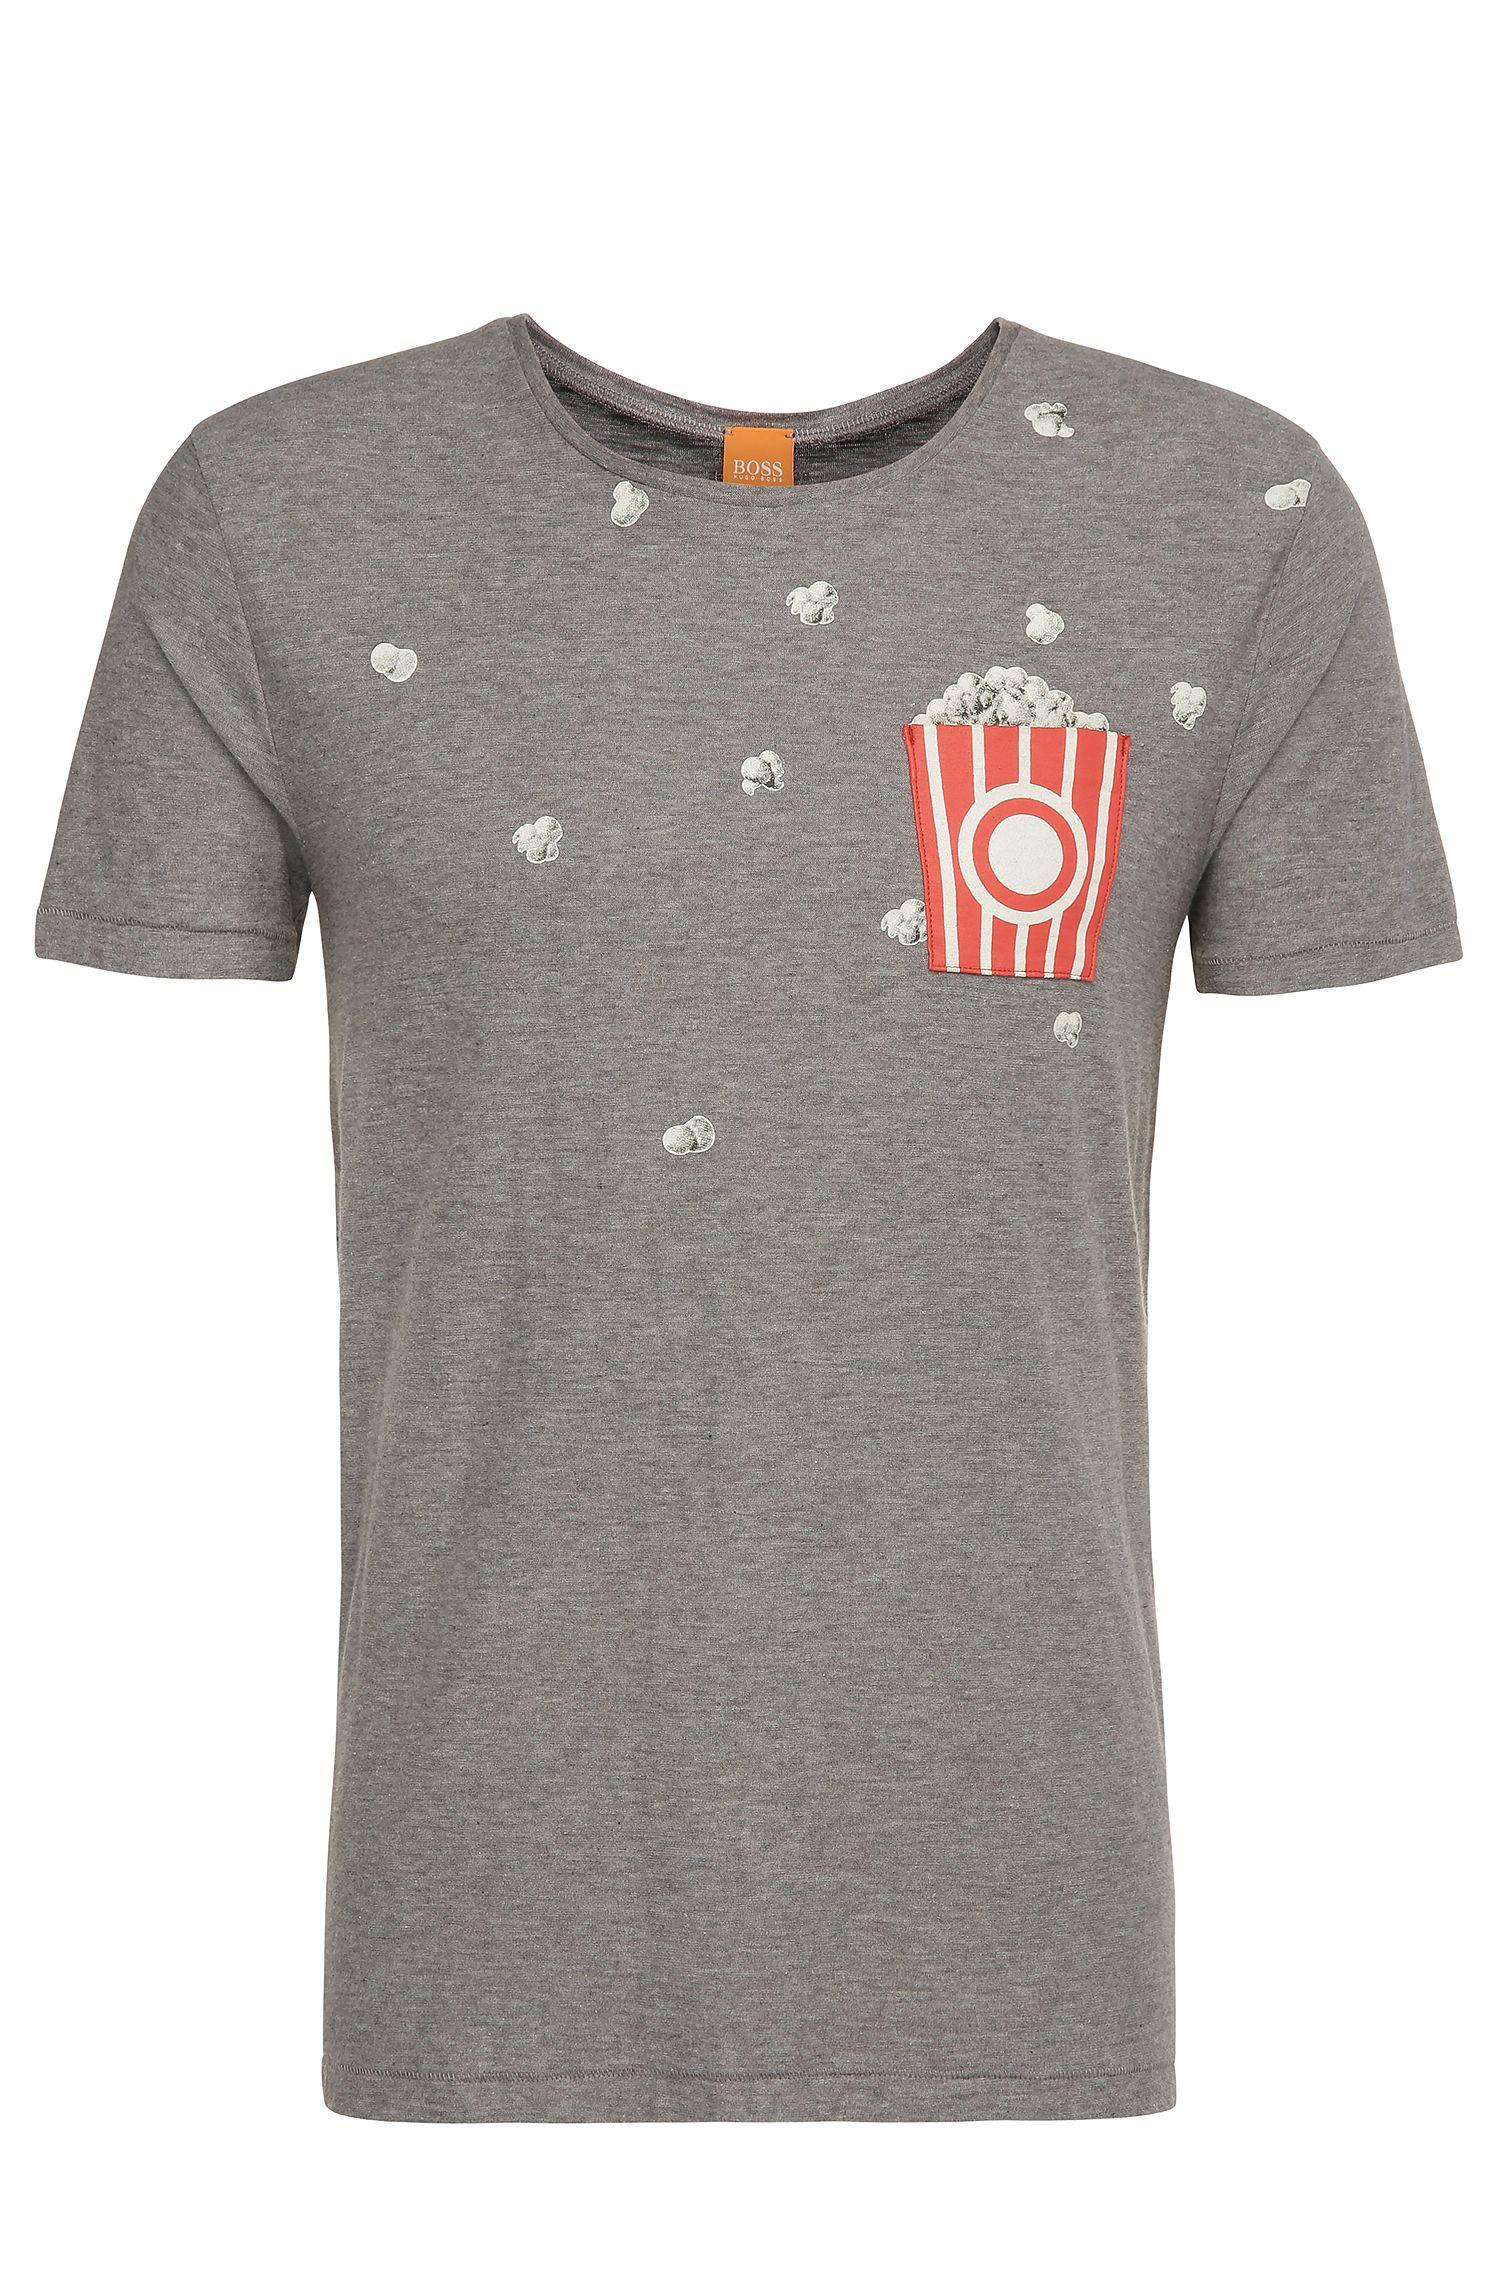 Cotton Slub Jersey Graphic T-Shirt | Toolbox